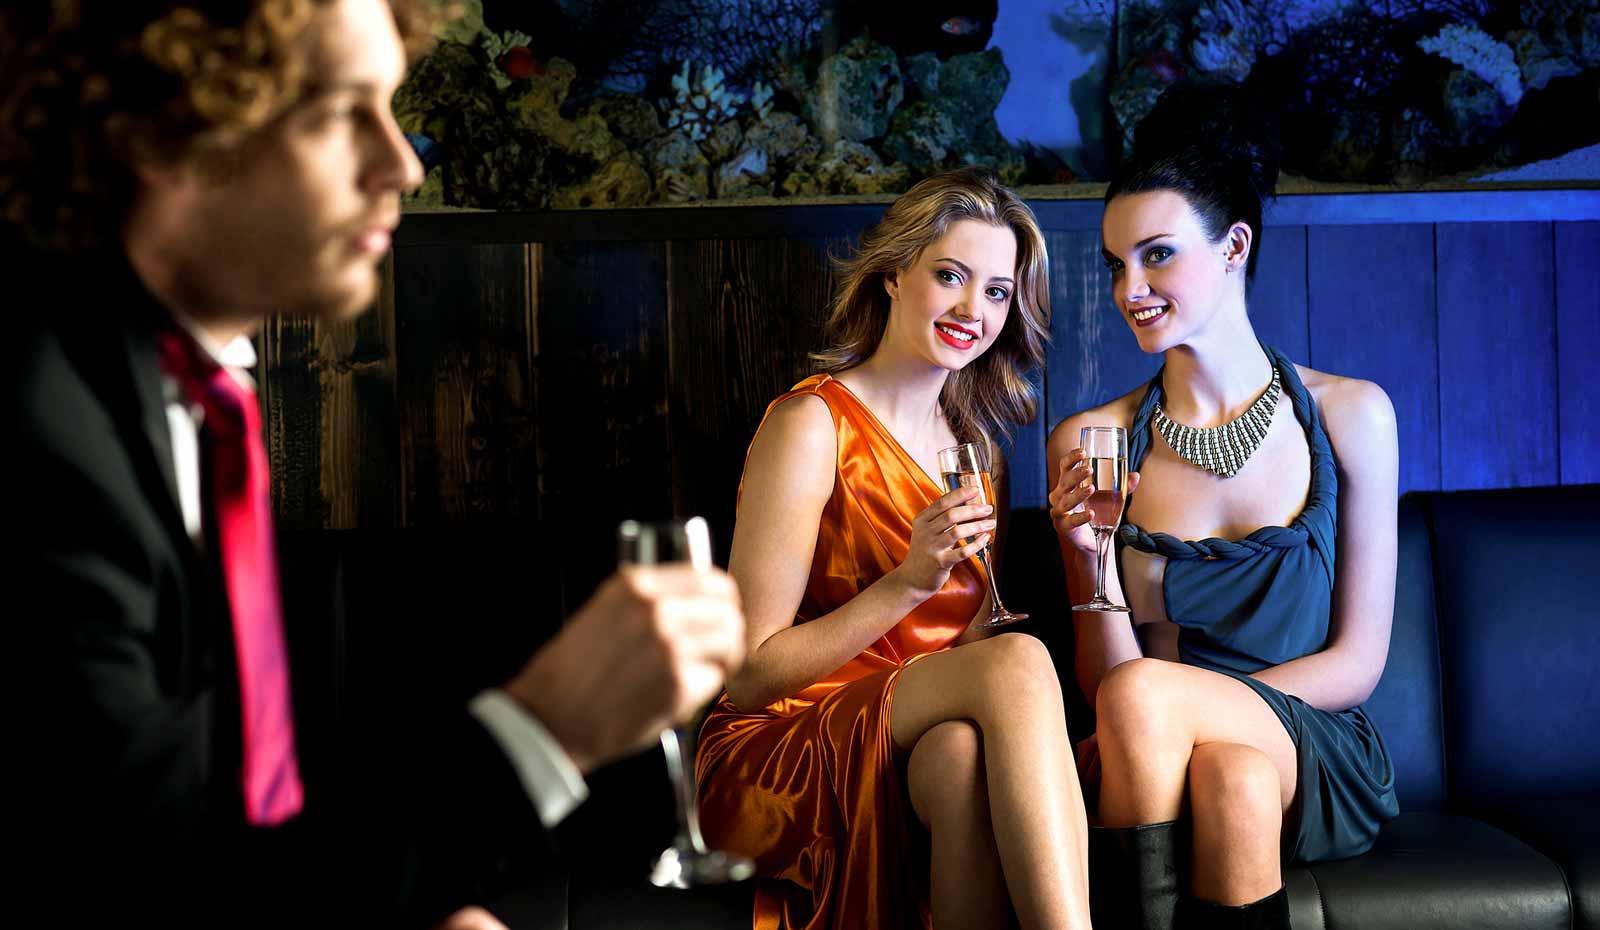 Adult Personals Online Sex Dating Local Swingers Seeking Orgasm Female Massage